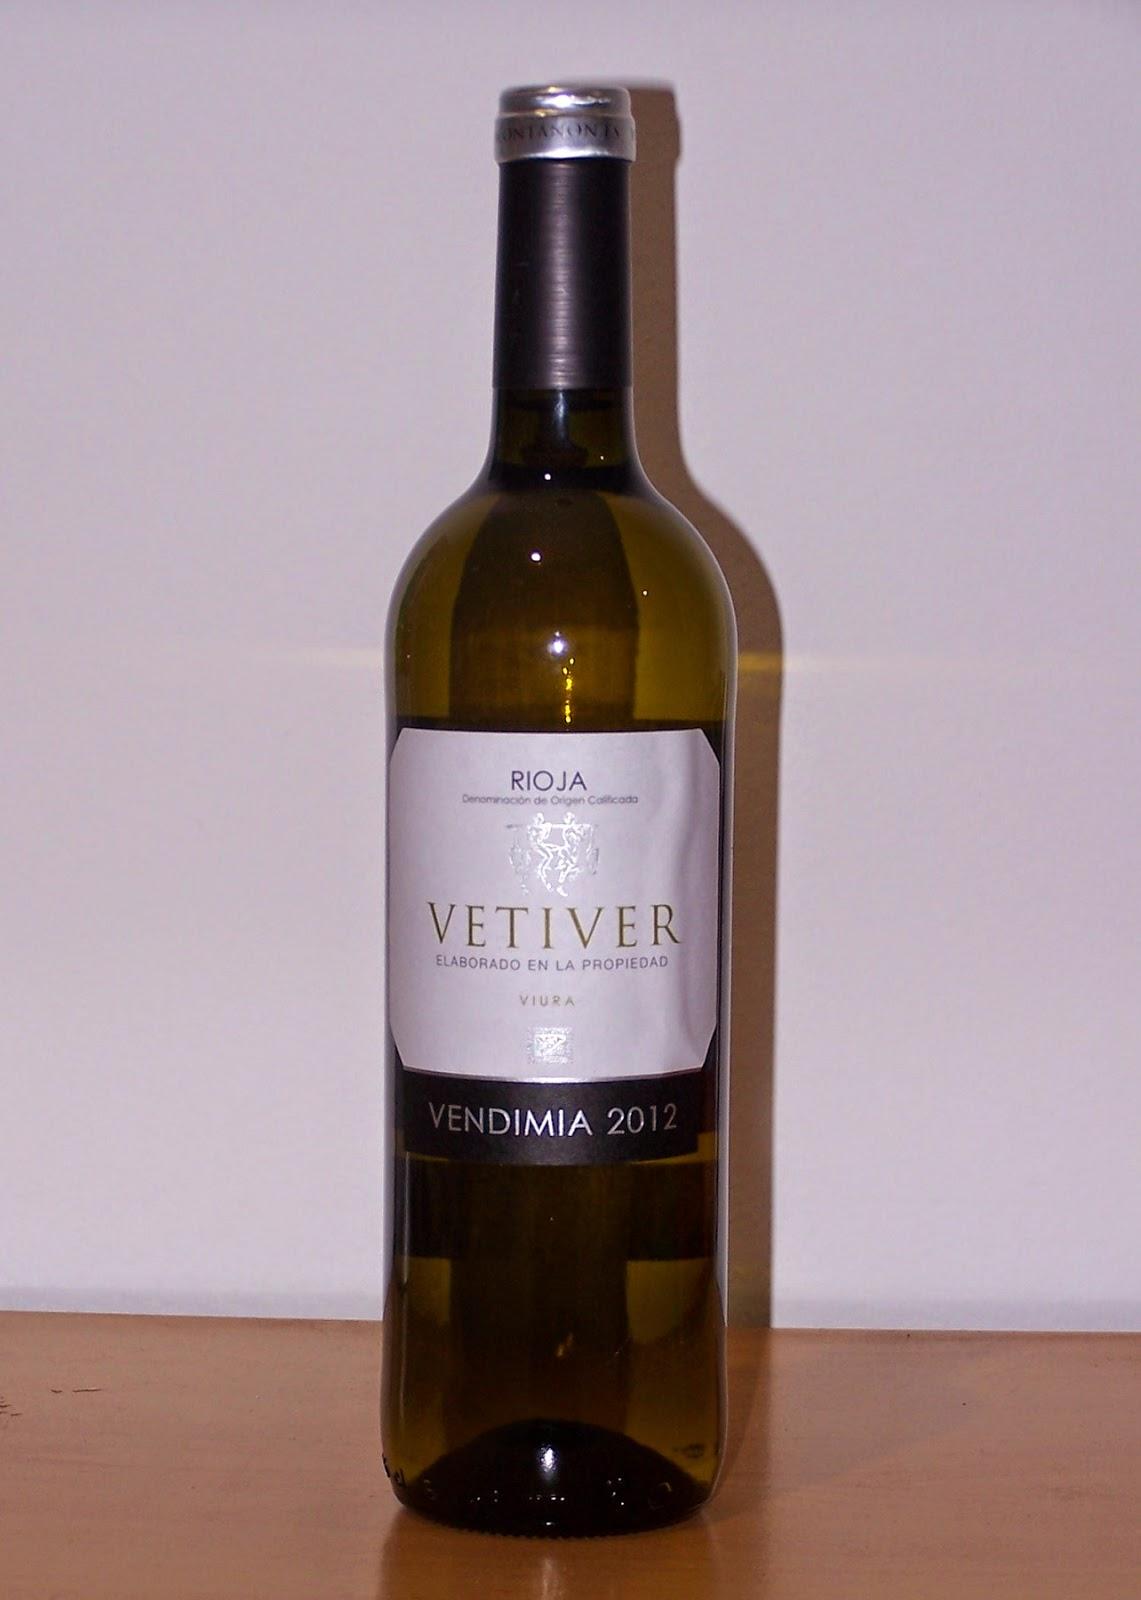 Vetiver 2012, D.o.c Rioja